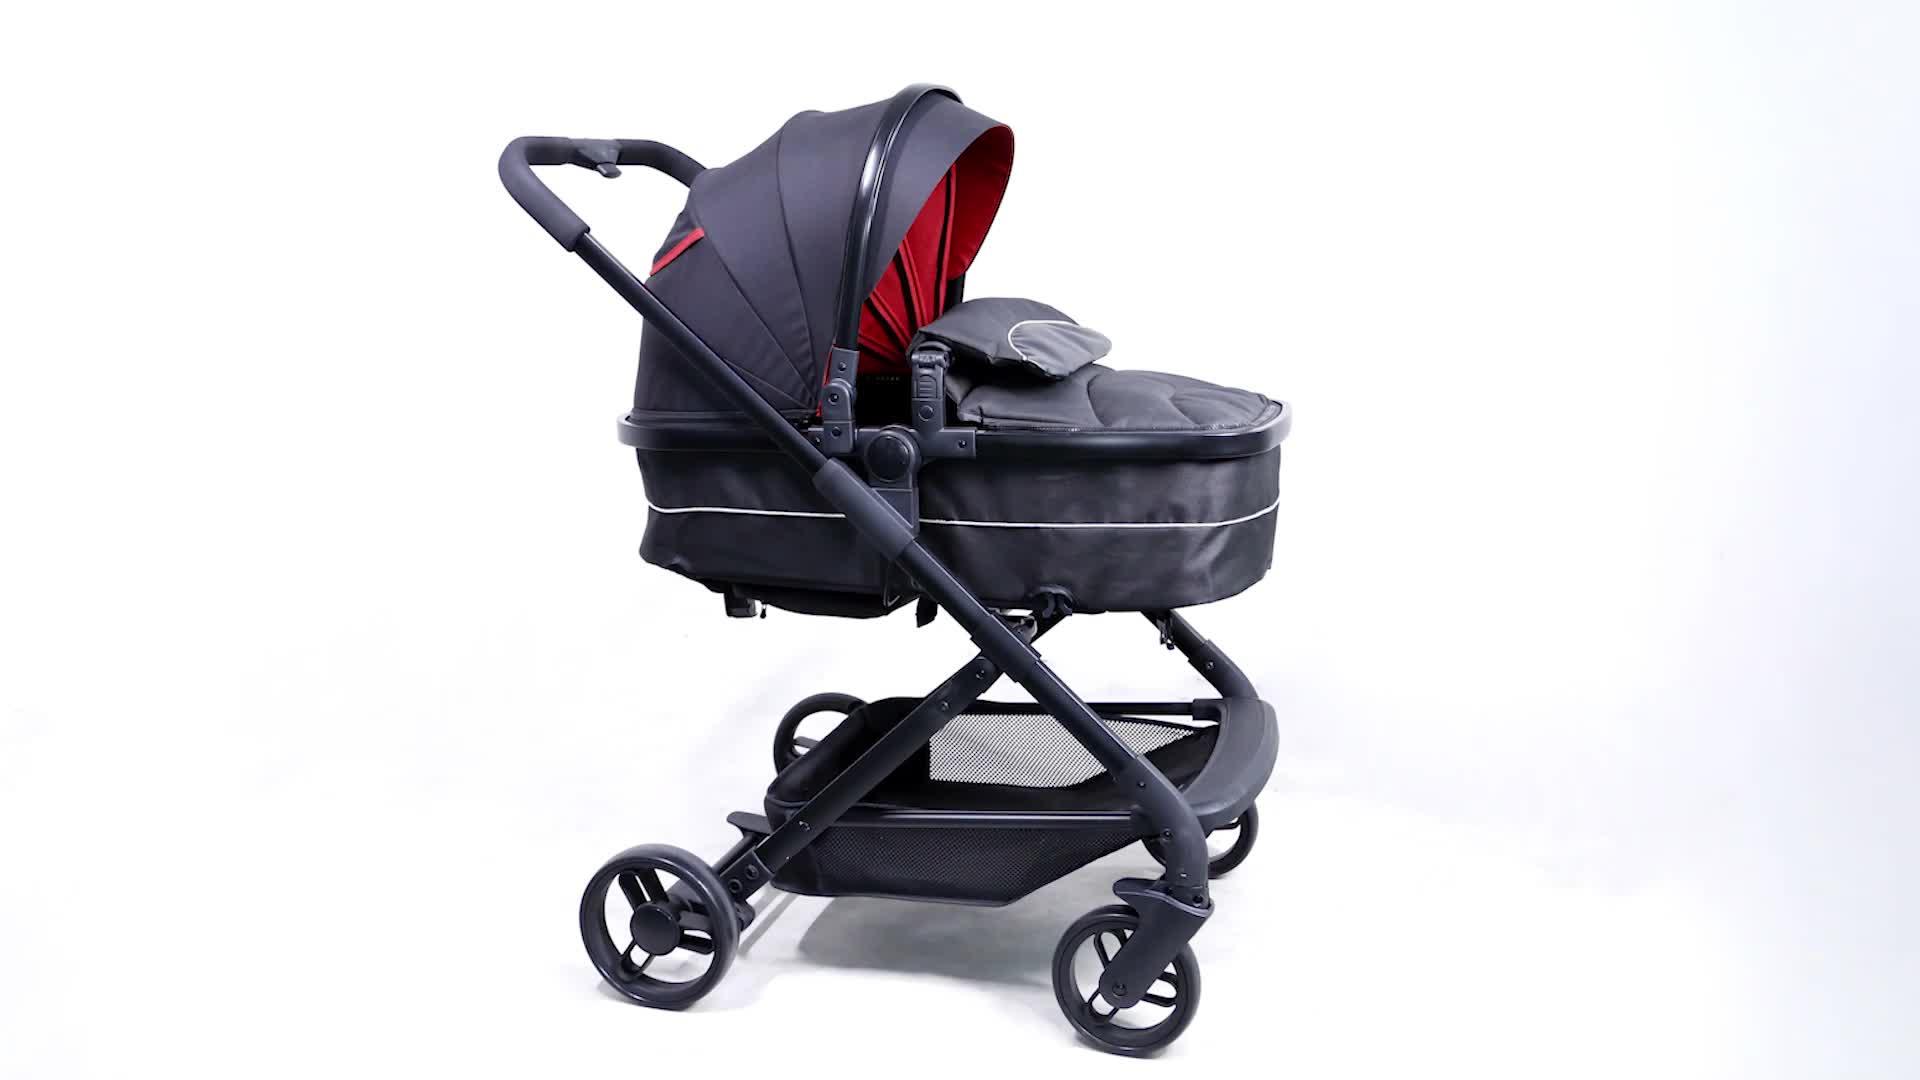 Luxury Aluminum High View Compact Lightweight Baby Stroller